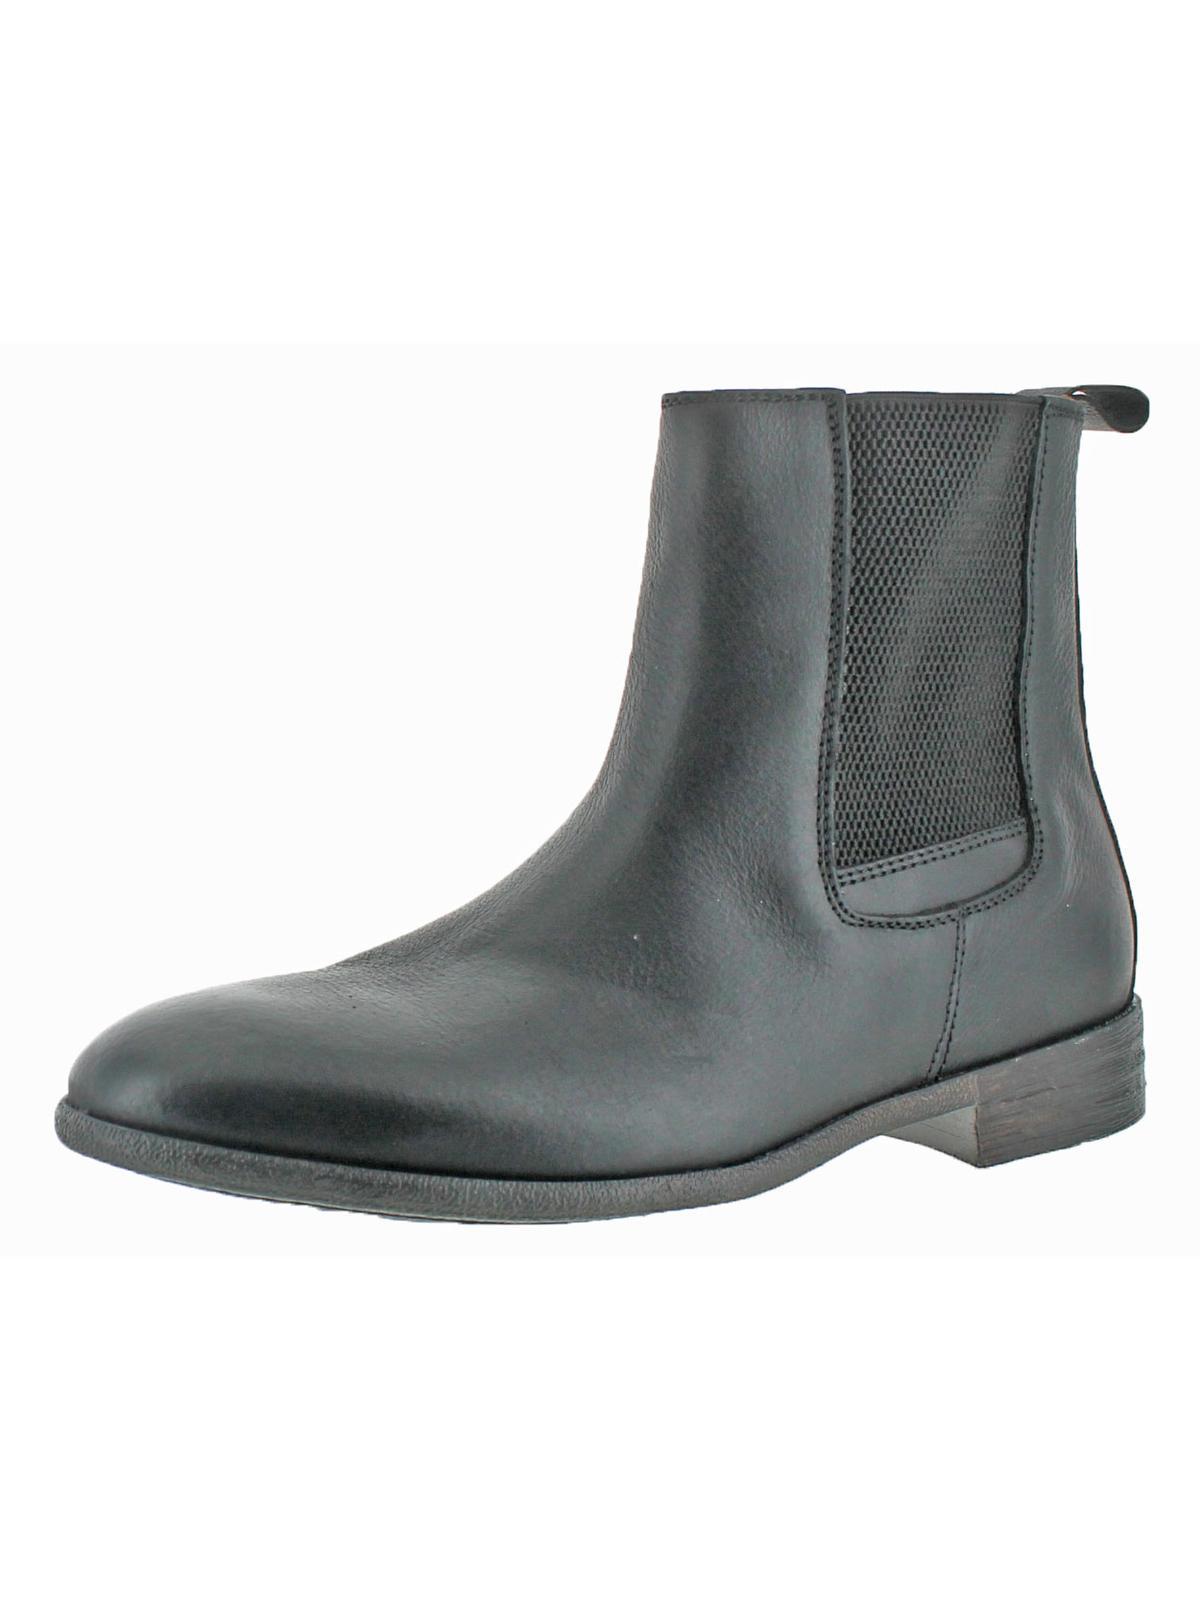 robert wayne mens oregon round toe casual chelsea boots